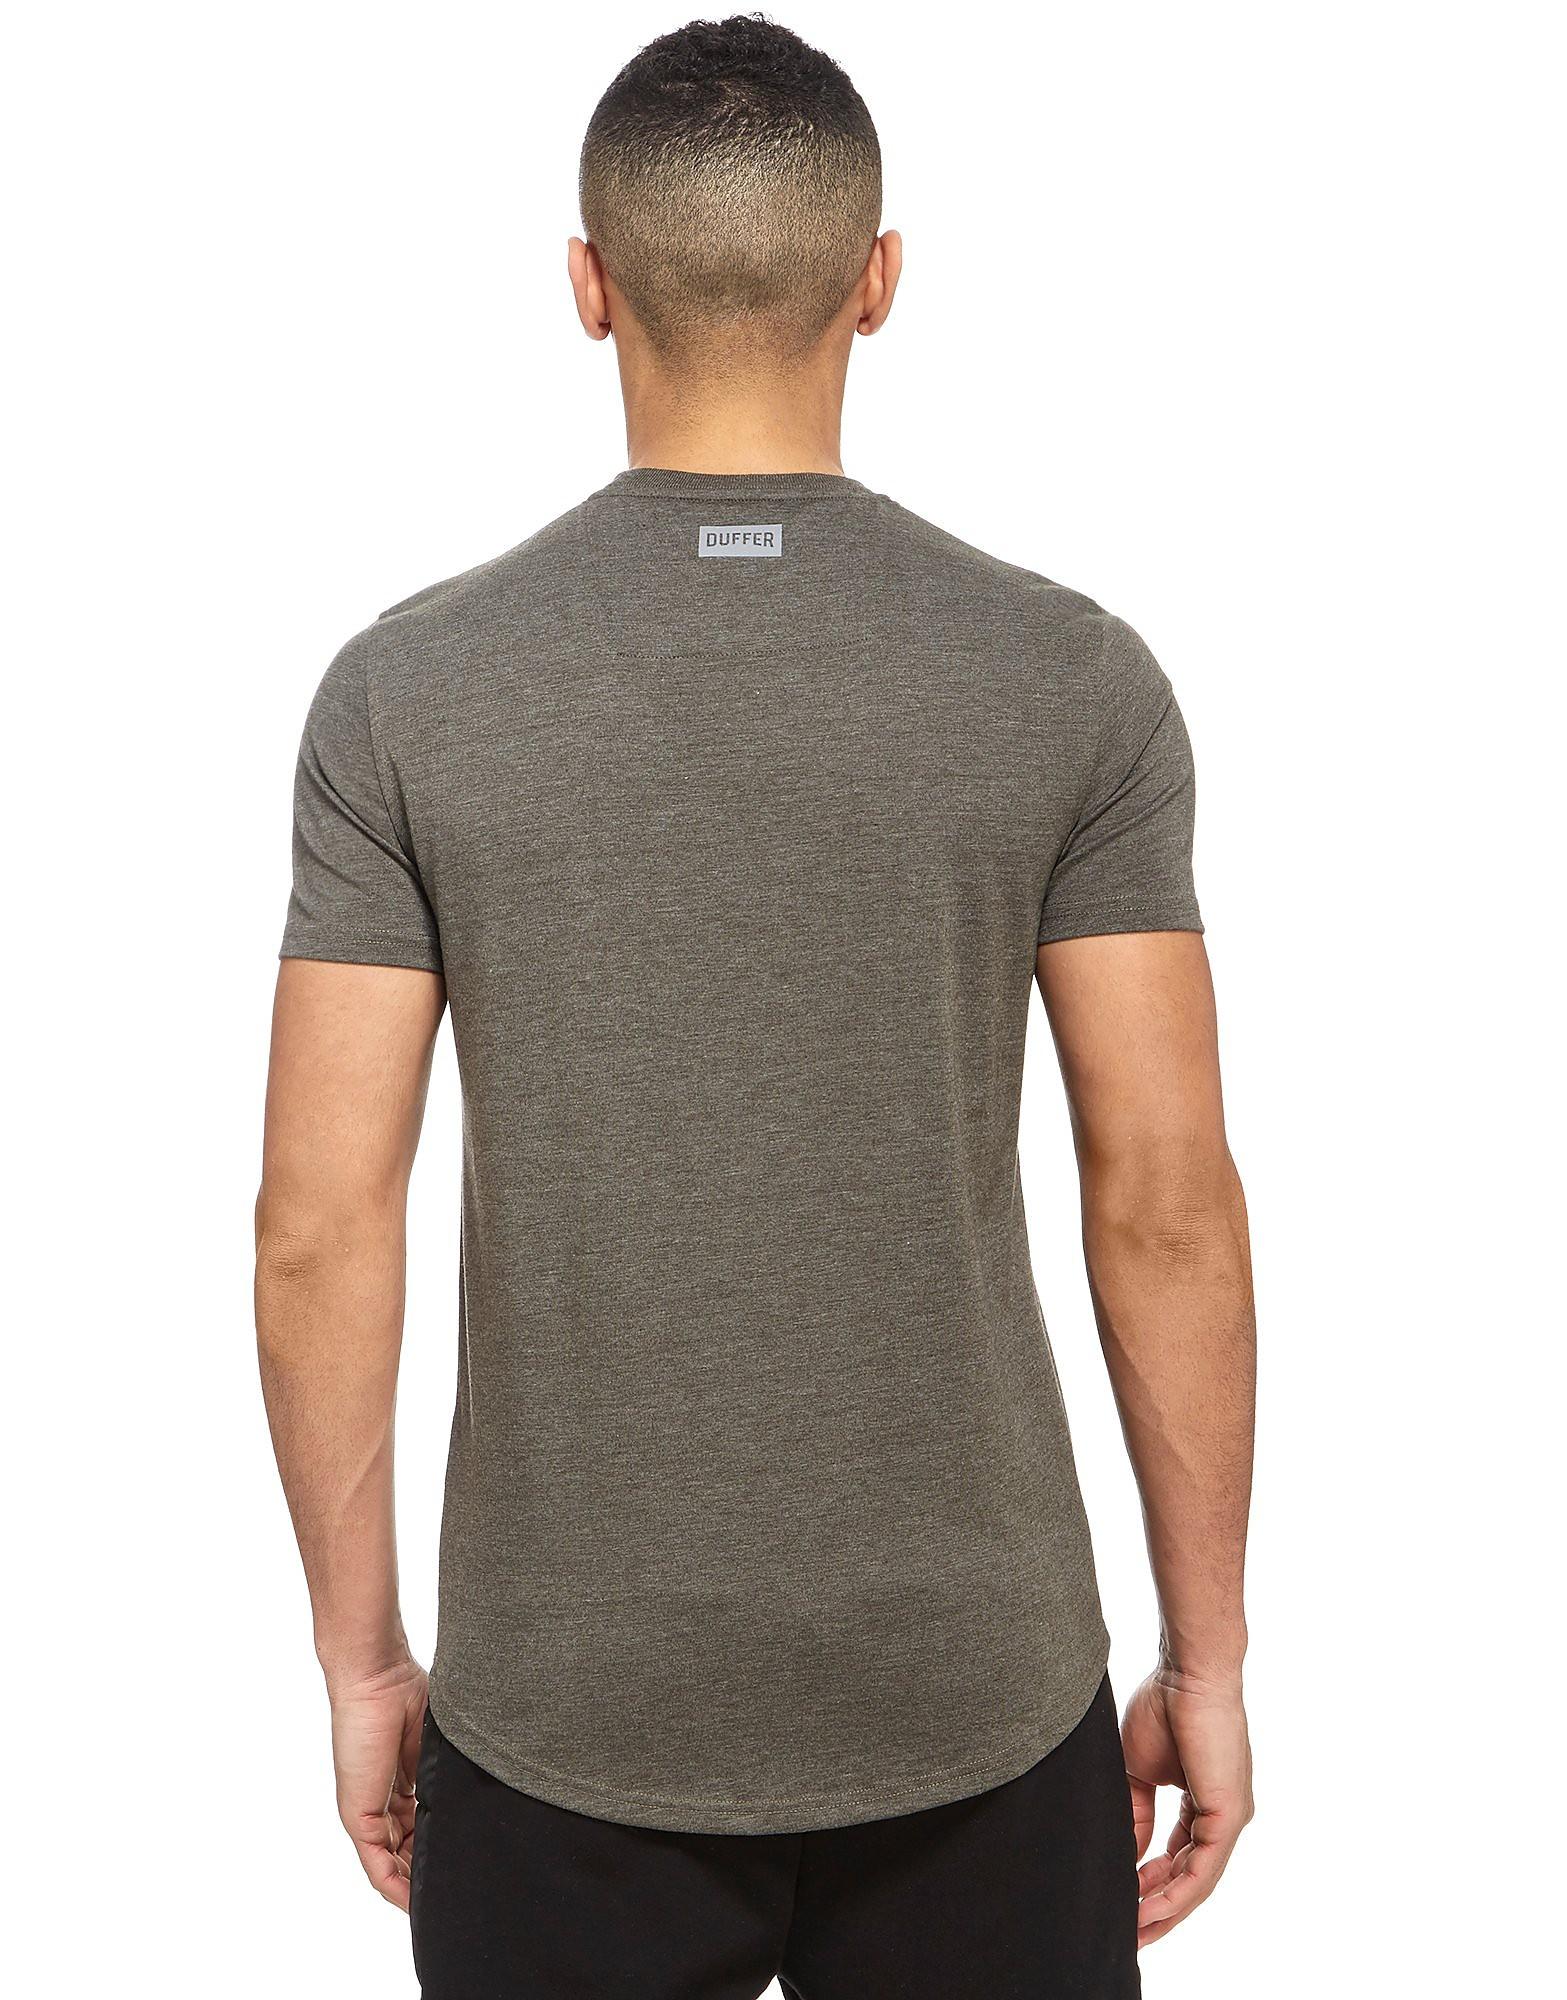 Duffer of St George Resource T-Shirt